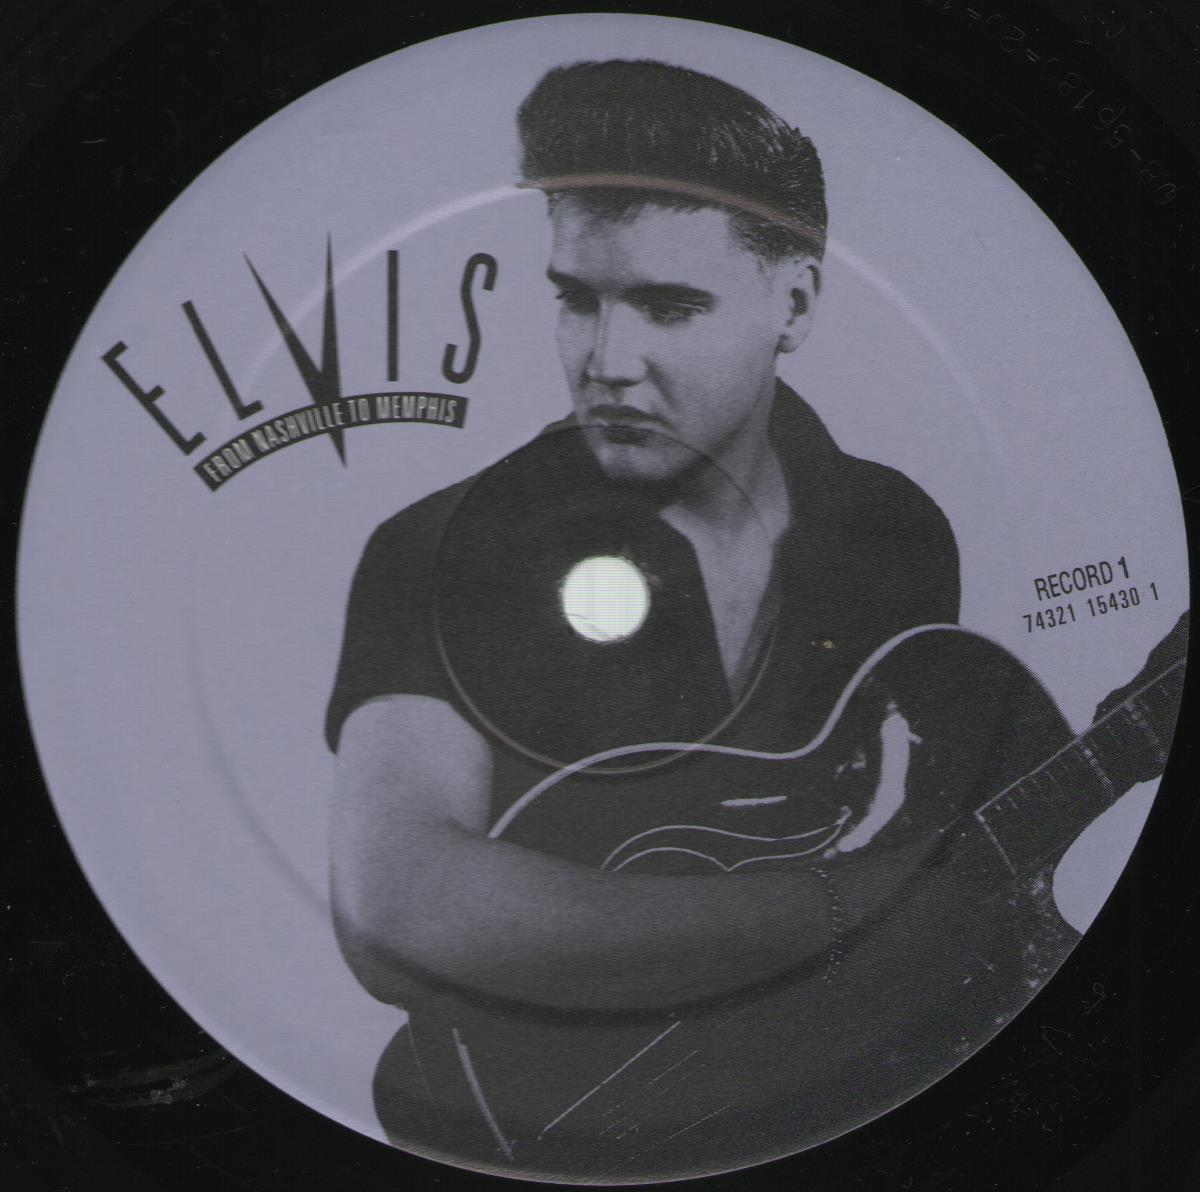 ELVIS - FROM NASHVILLE TO MEMPHIS - THE ESSENTIAL 60'S MASTERS Bild2kgszi